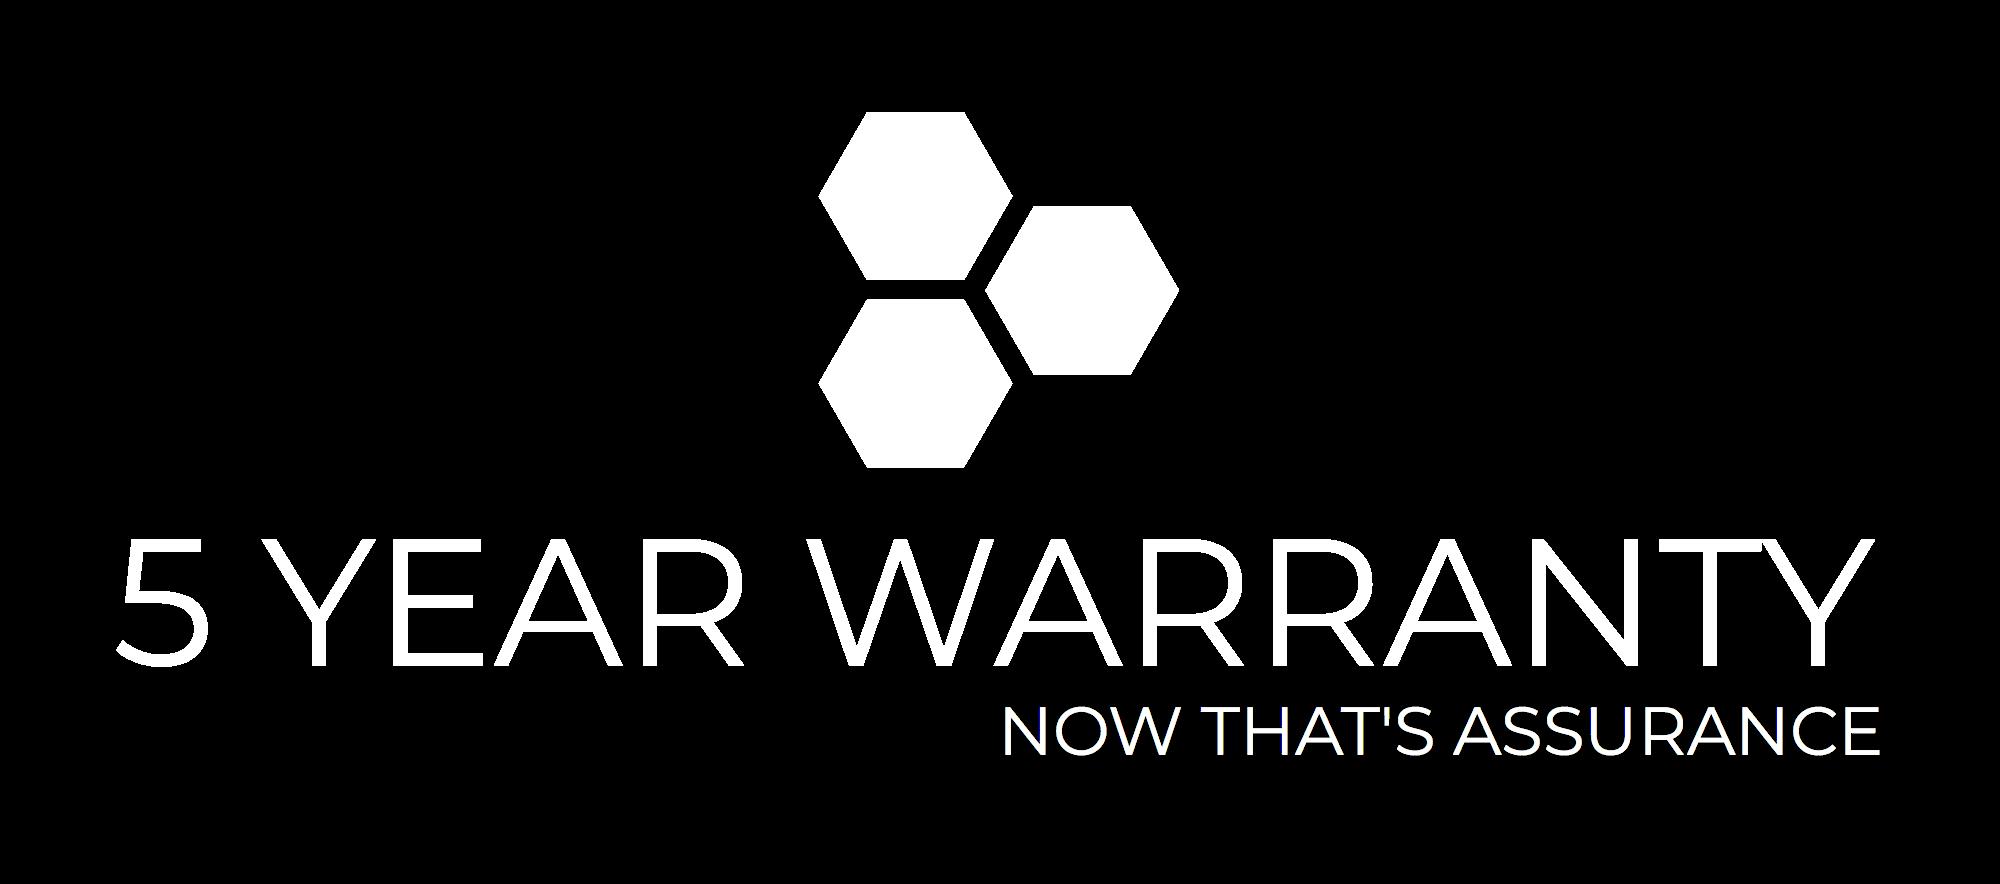 5 YEAR WARRANTY-logo-white.png